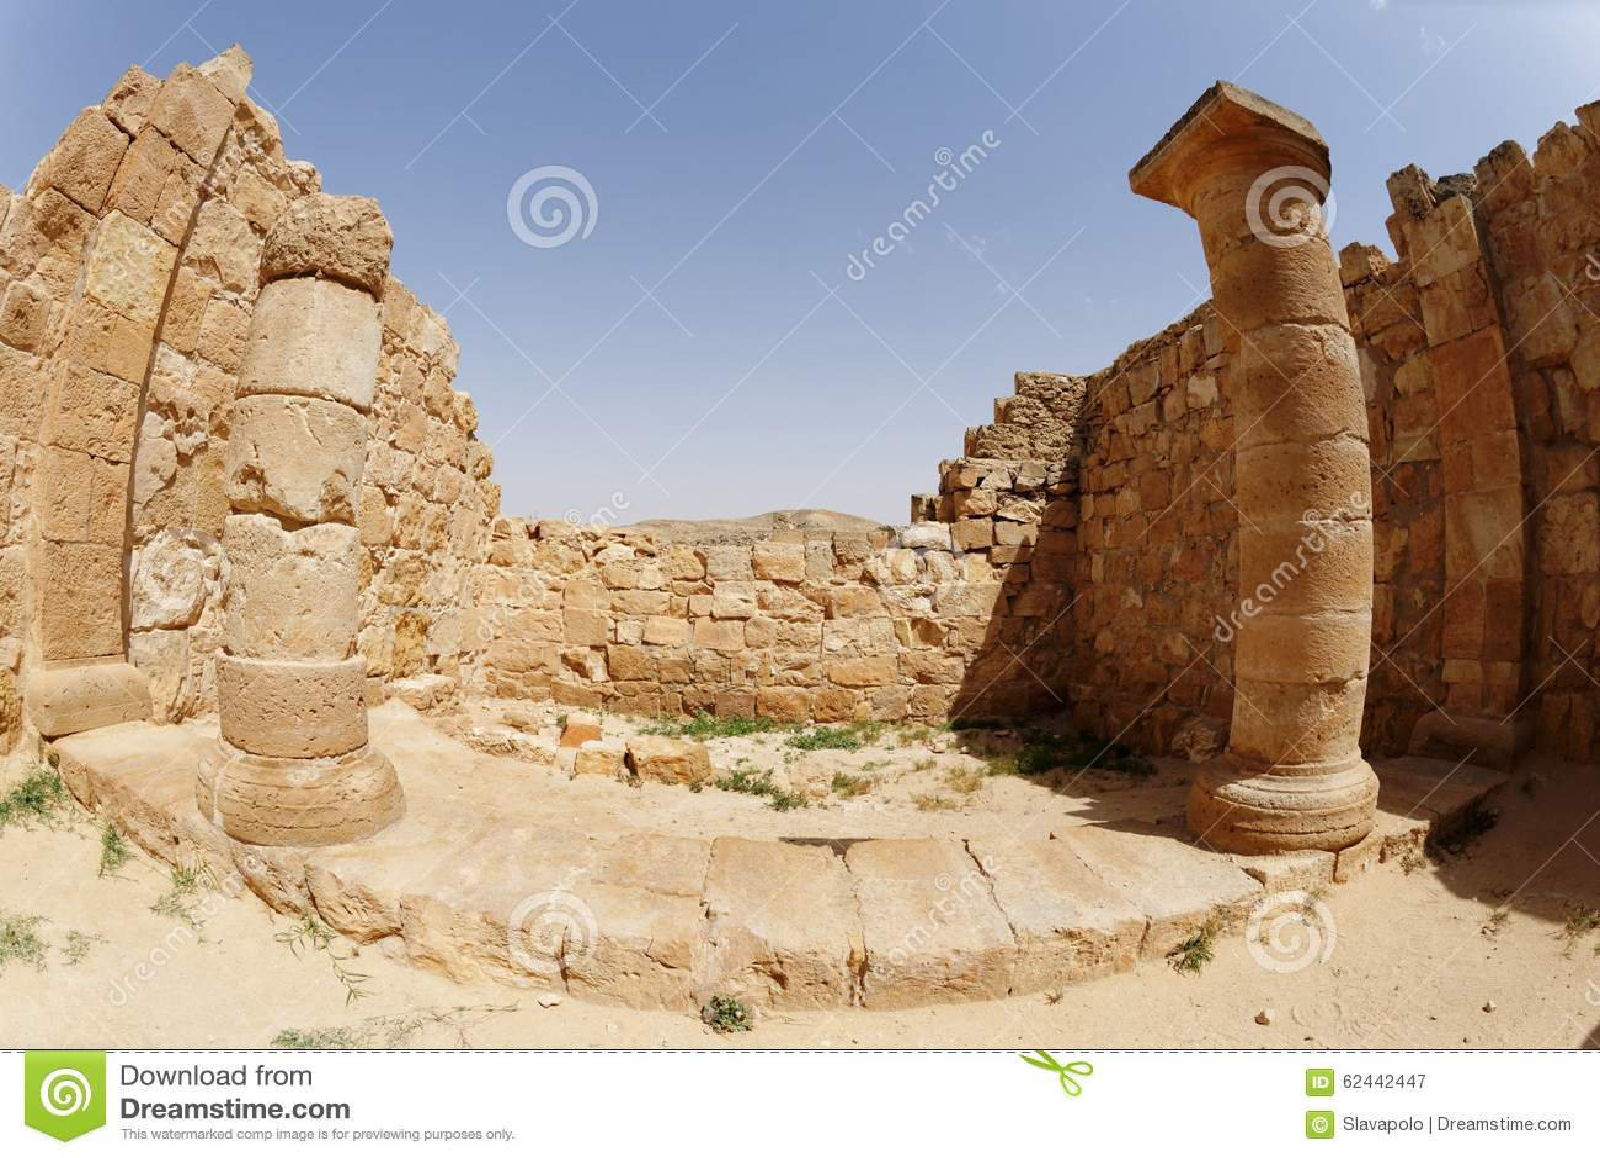 Fisheye view of ancient temple colonnade in Avdat, Israel